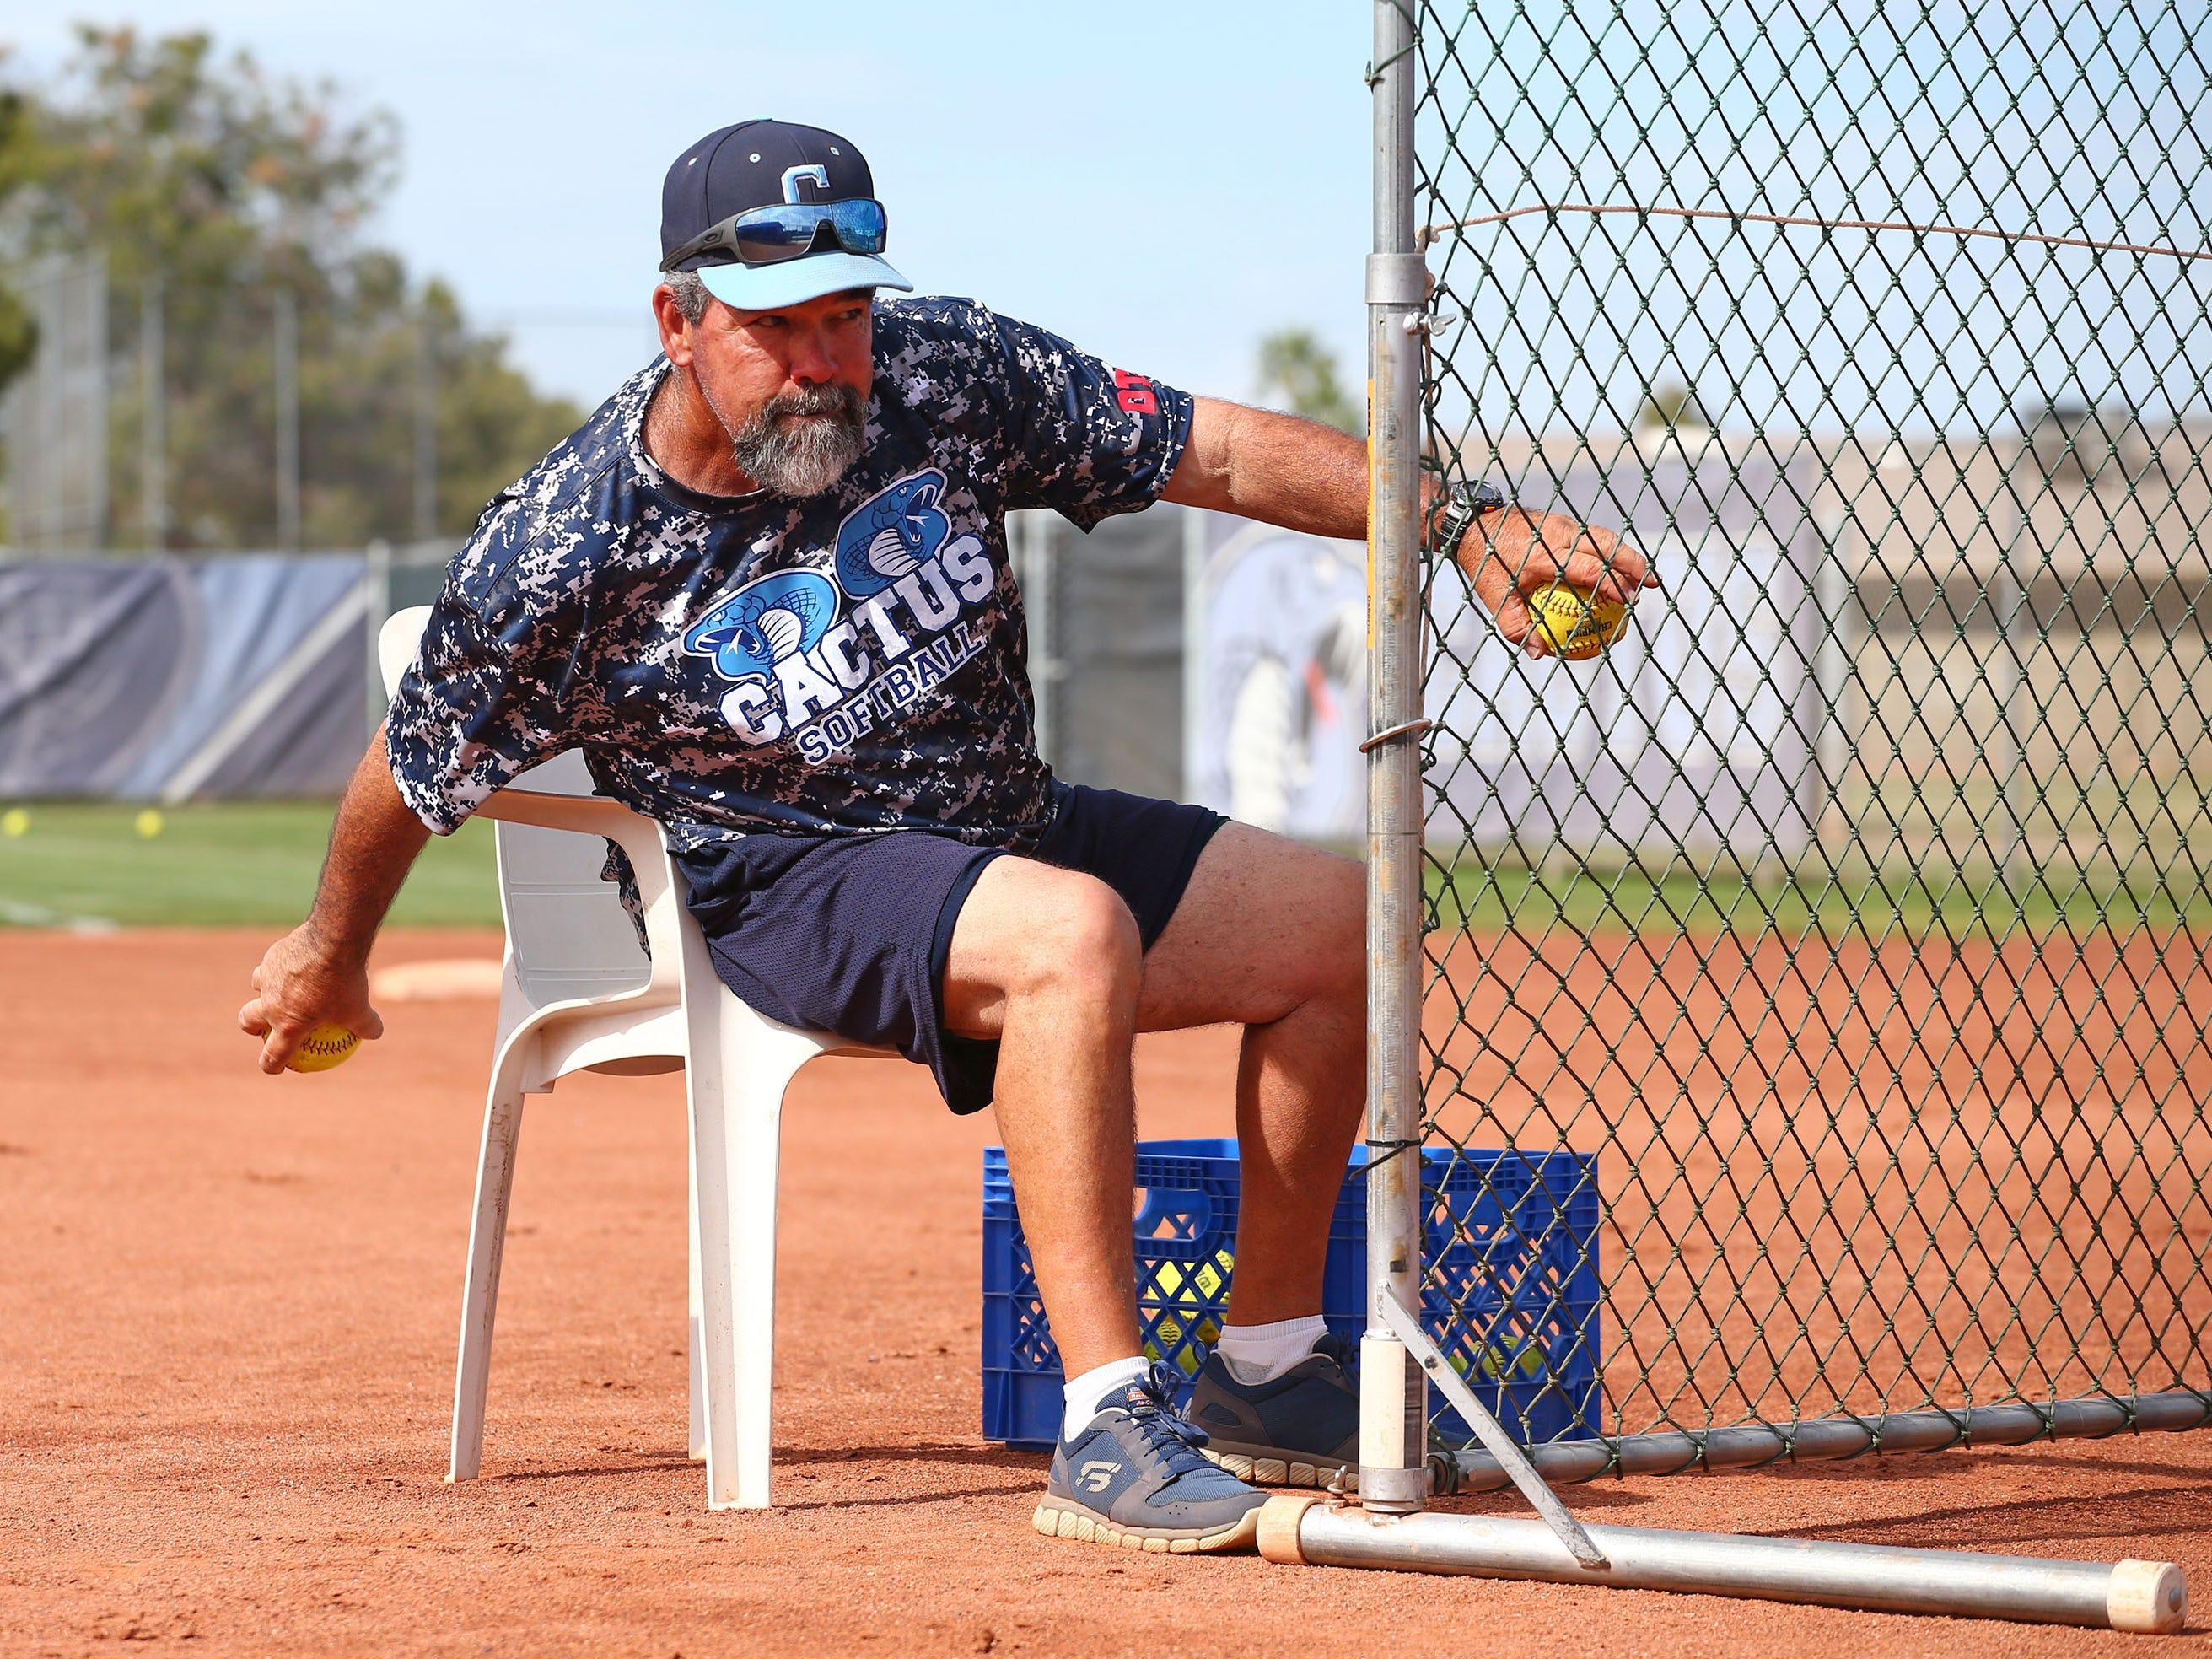 Cactus High softball coach Bartt Underwood during practice on Apr. 2, 2019 at Cactus High School in Glendale, Ariz.